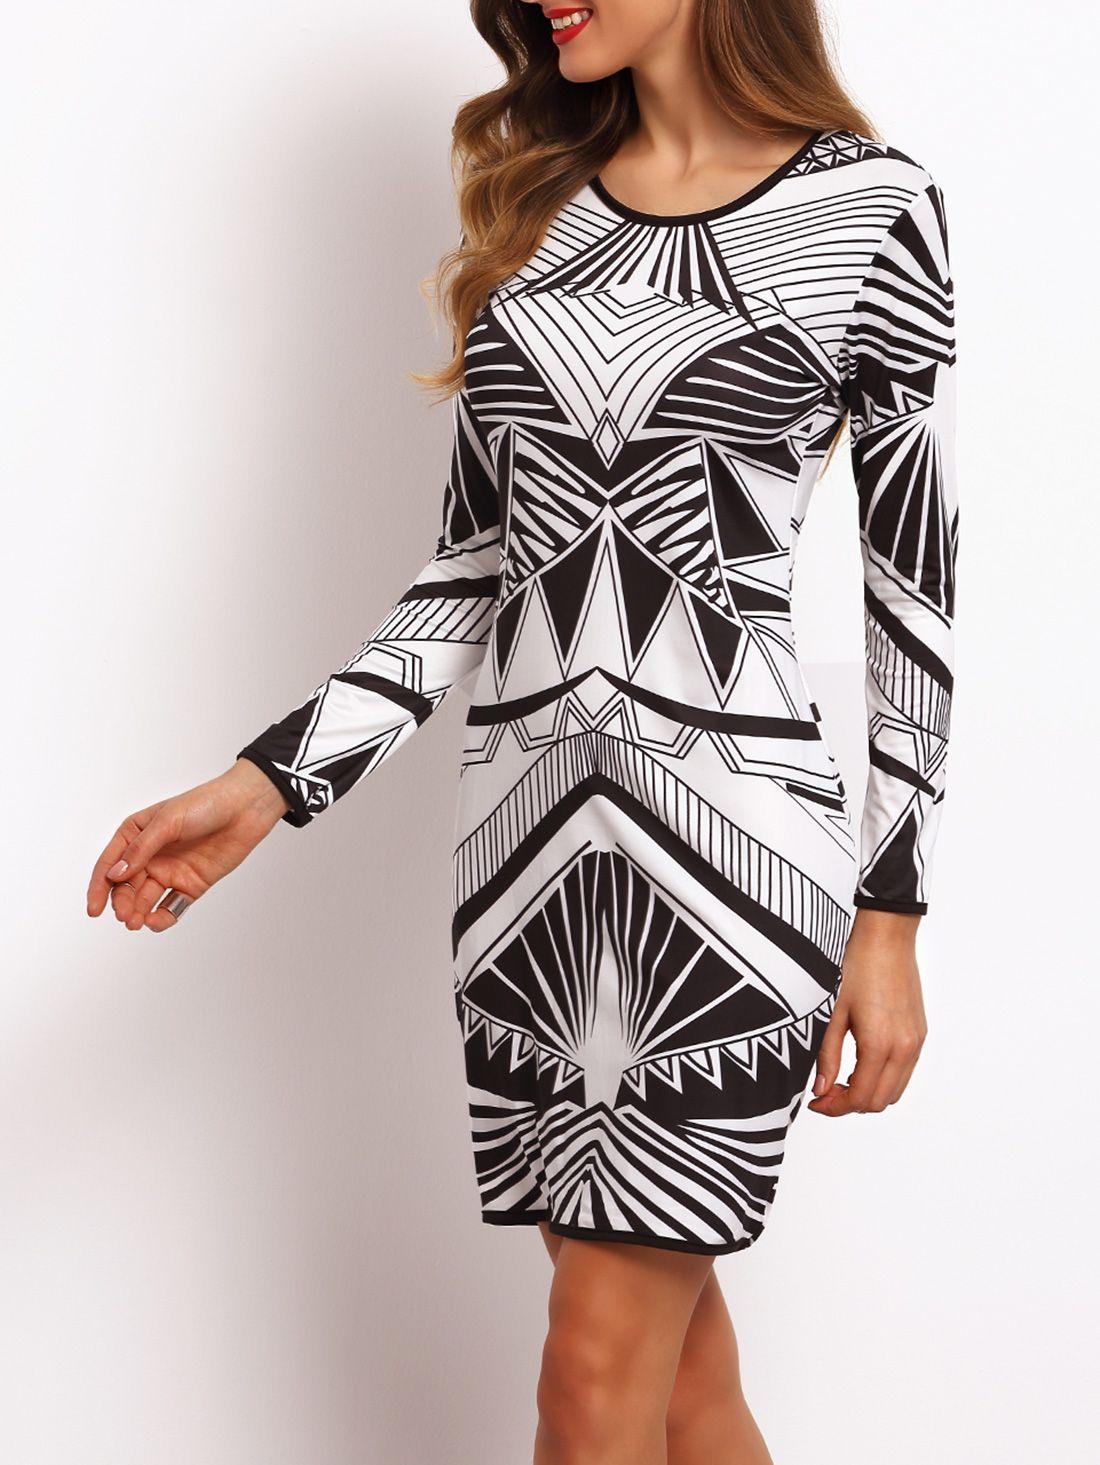 ¡Cómpralo ya!. Geometry Print Sheath Dress. Black and White Elegant Polyester Round Neck Long Sleeve Shift Short Geometric Fall Pencil Dresses. , vestidoinformal, casual, informales, informal, day, kleidcasual, vestidoinformal, robeinformelle, vestitoinformale, día. Vestido informal  de mujer   de SheIn.